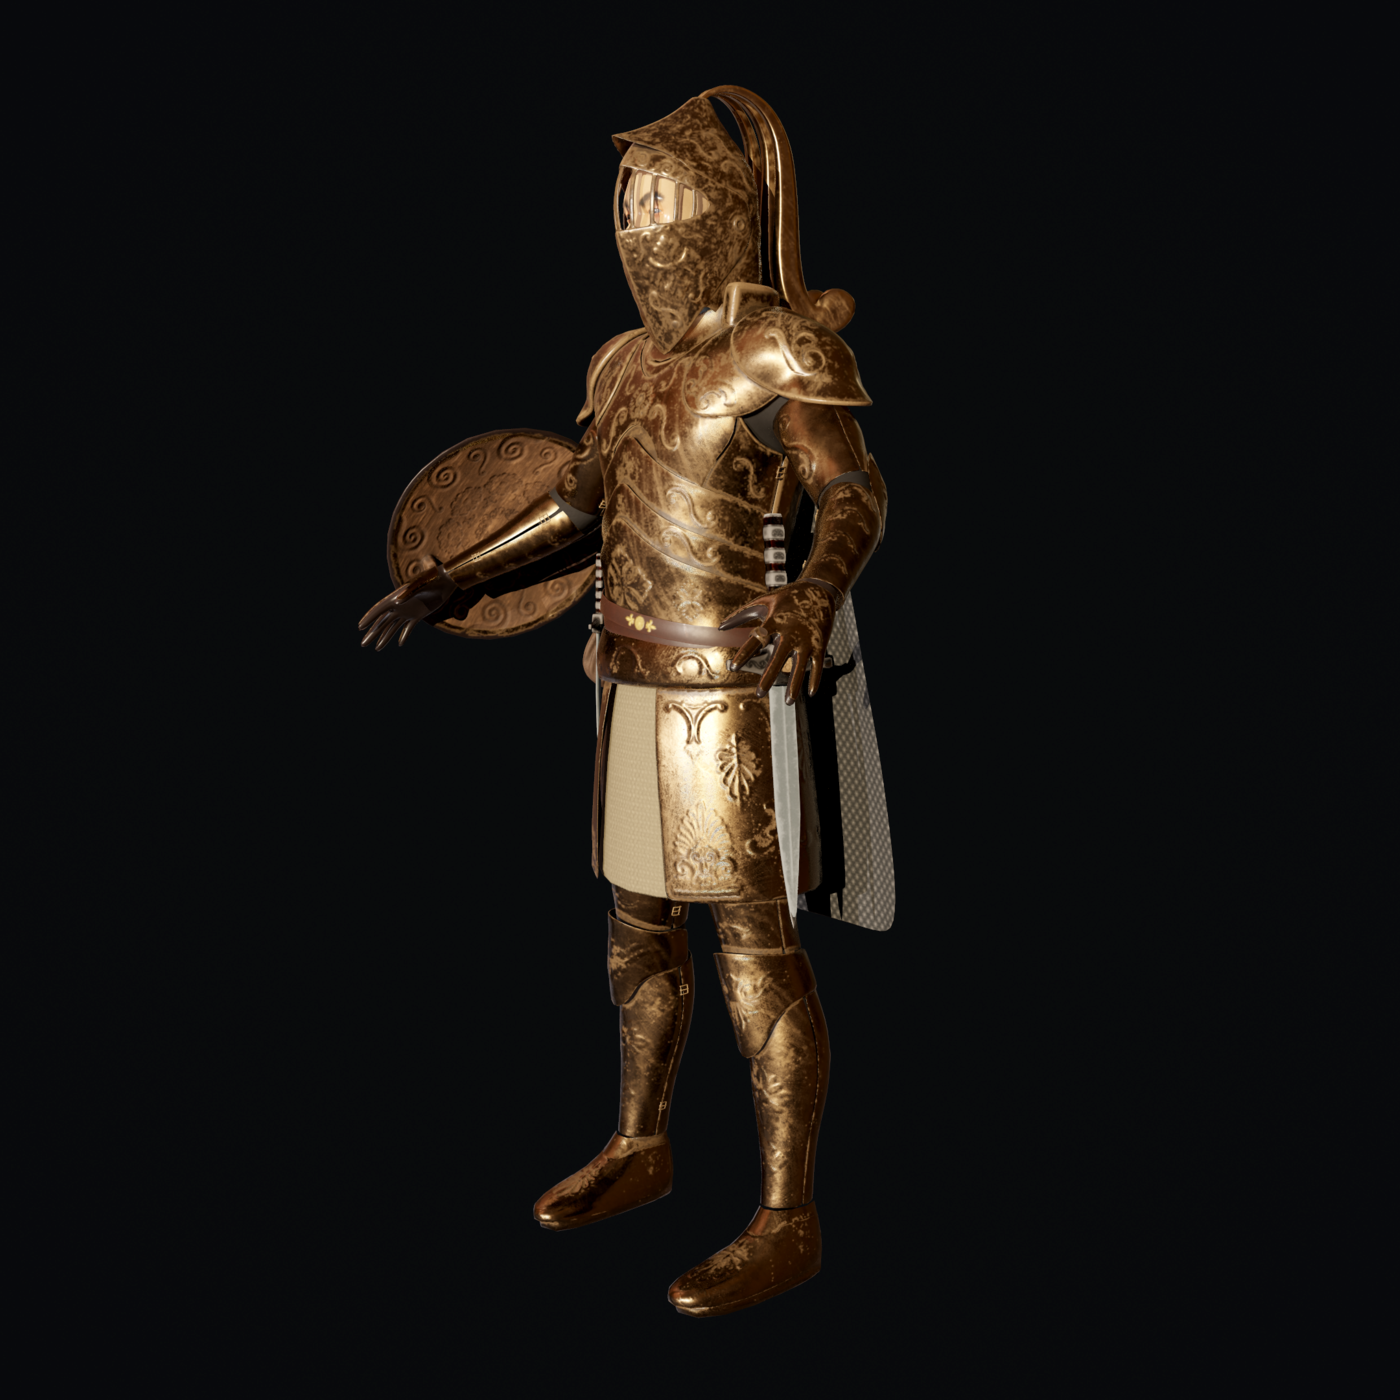 Knight Character Model